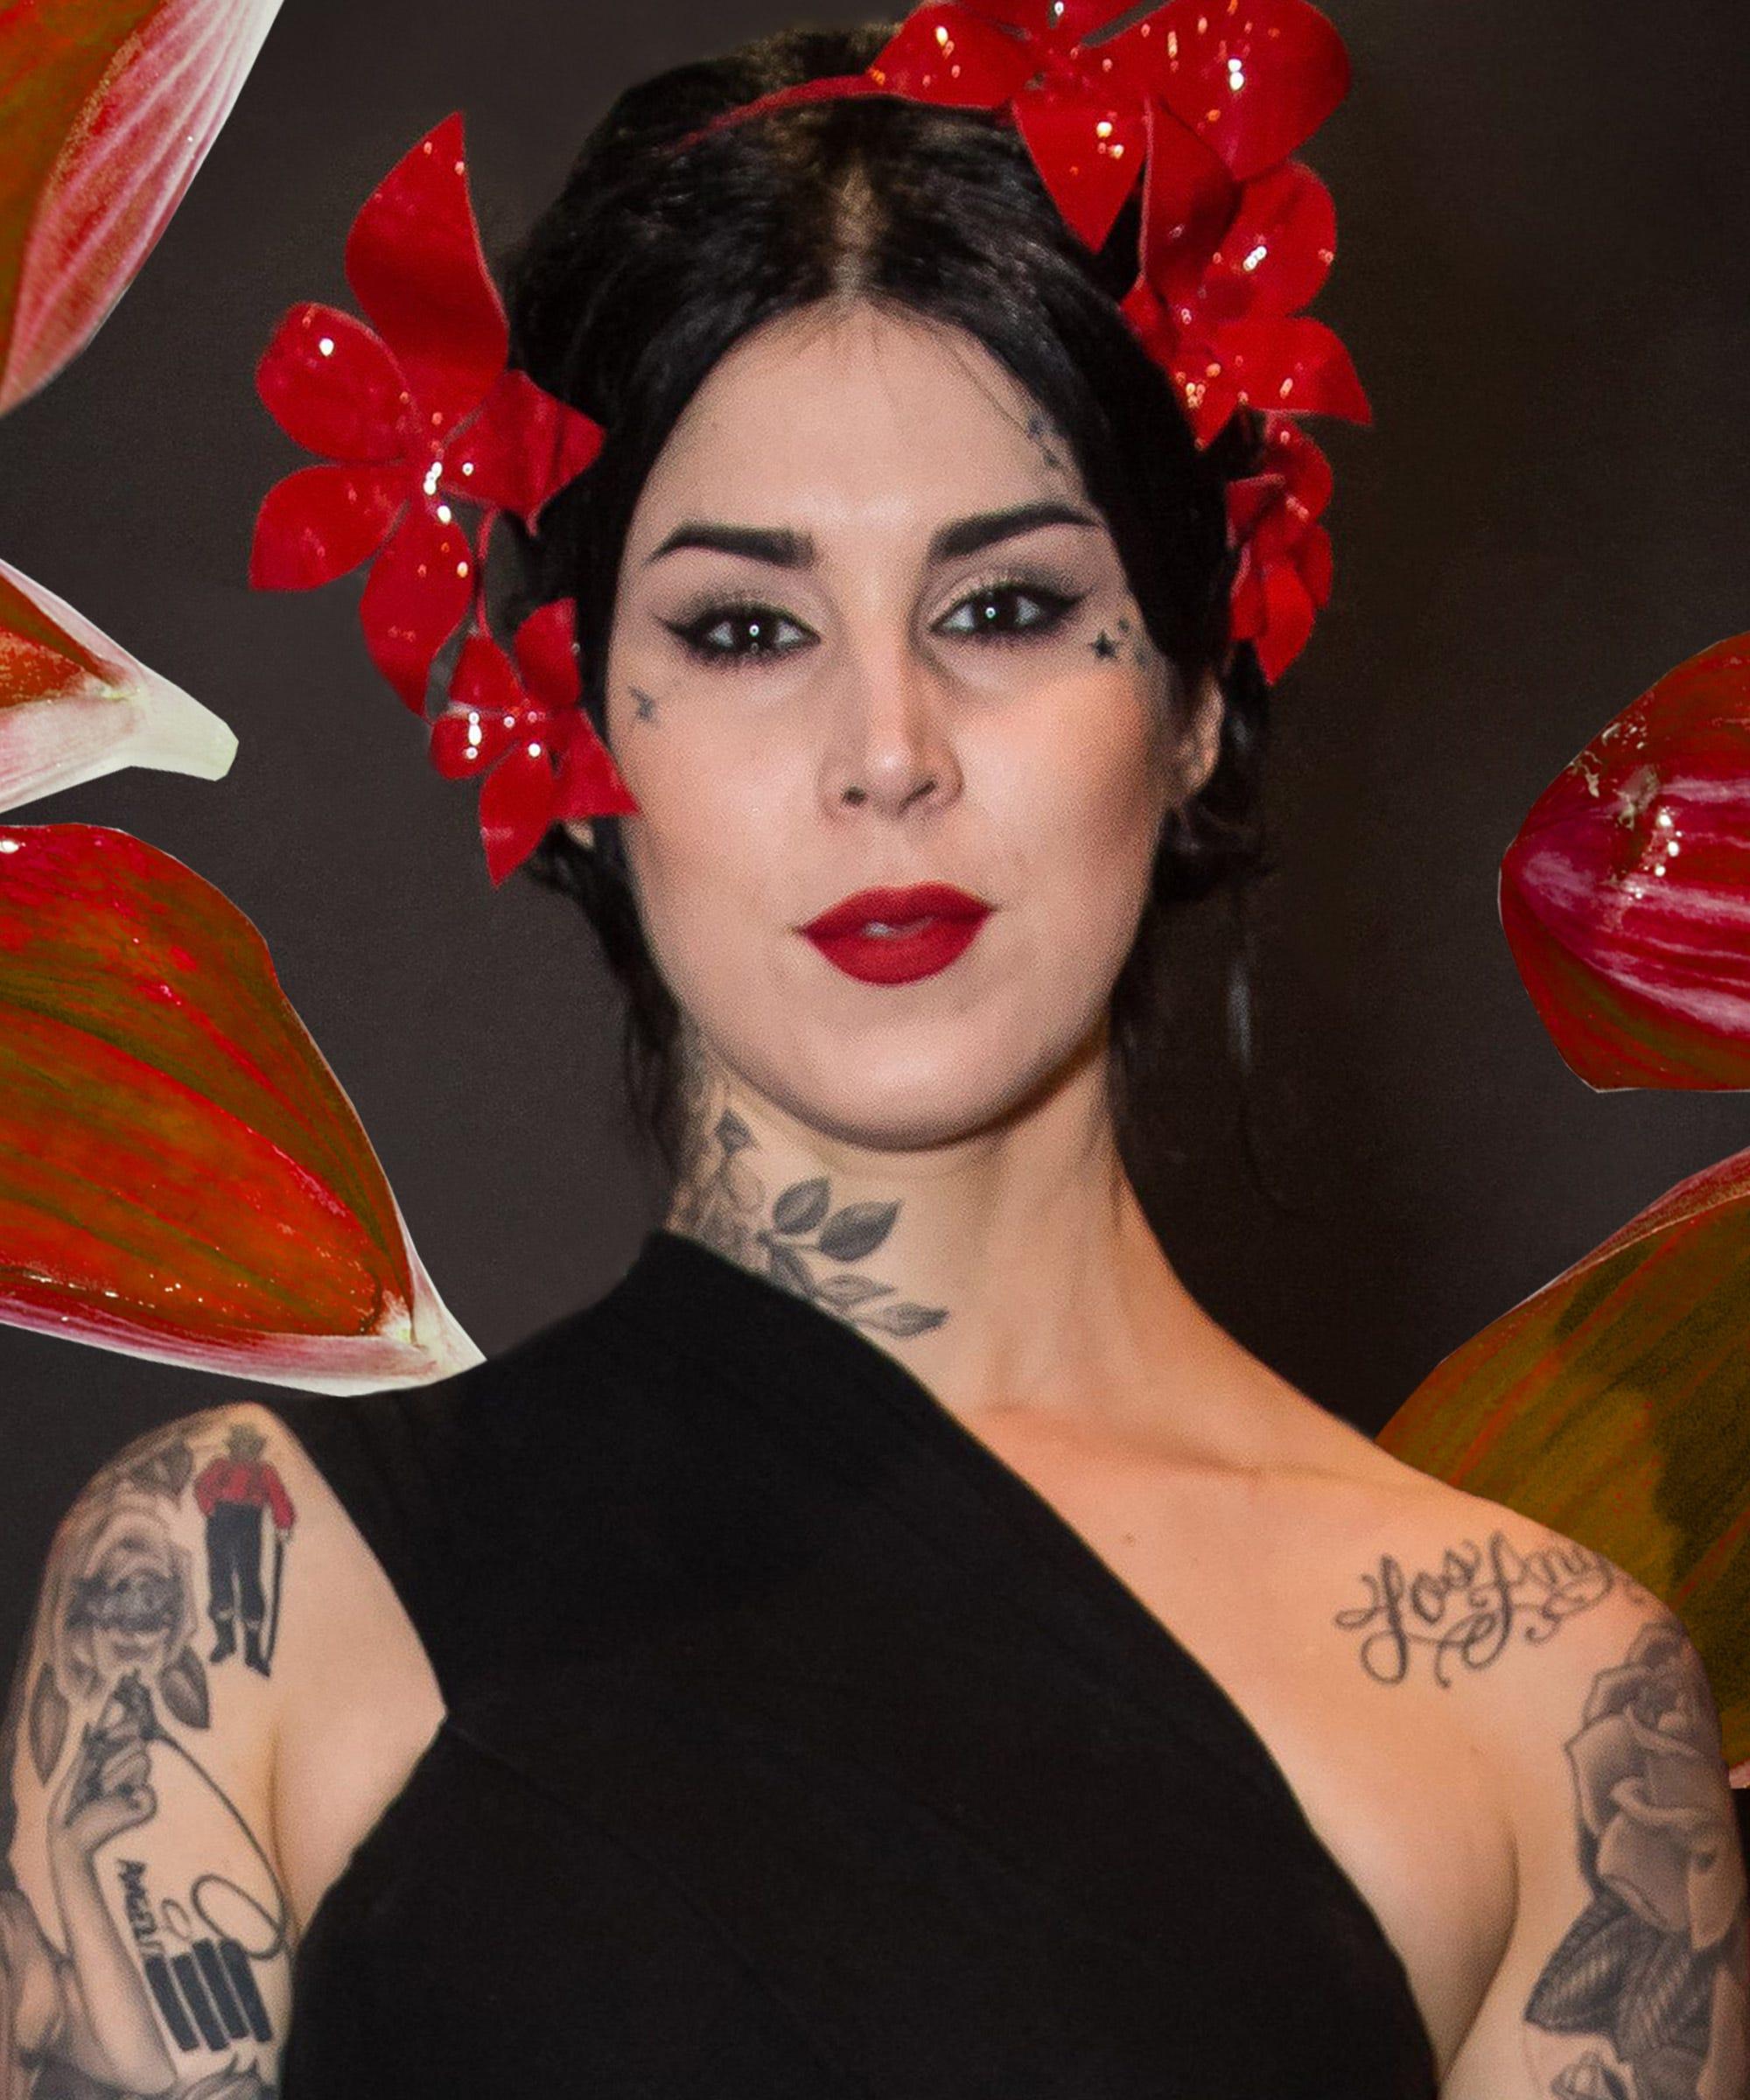 Kat von d fantasy celebrity makeover recommendations dress for everyday in 2019